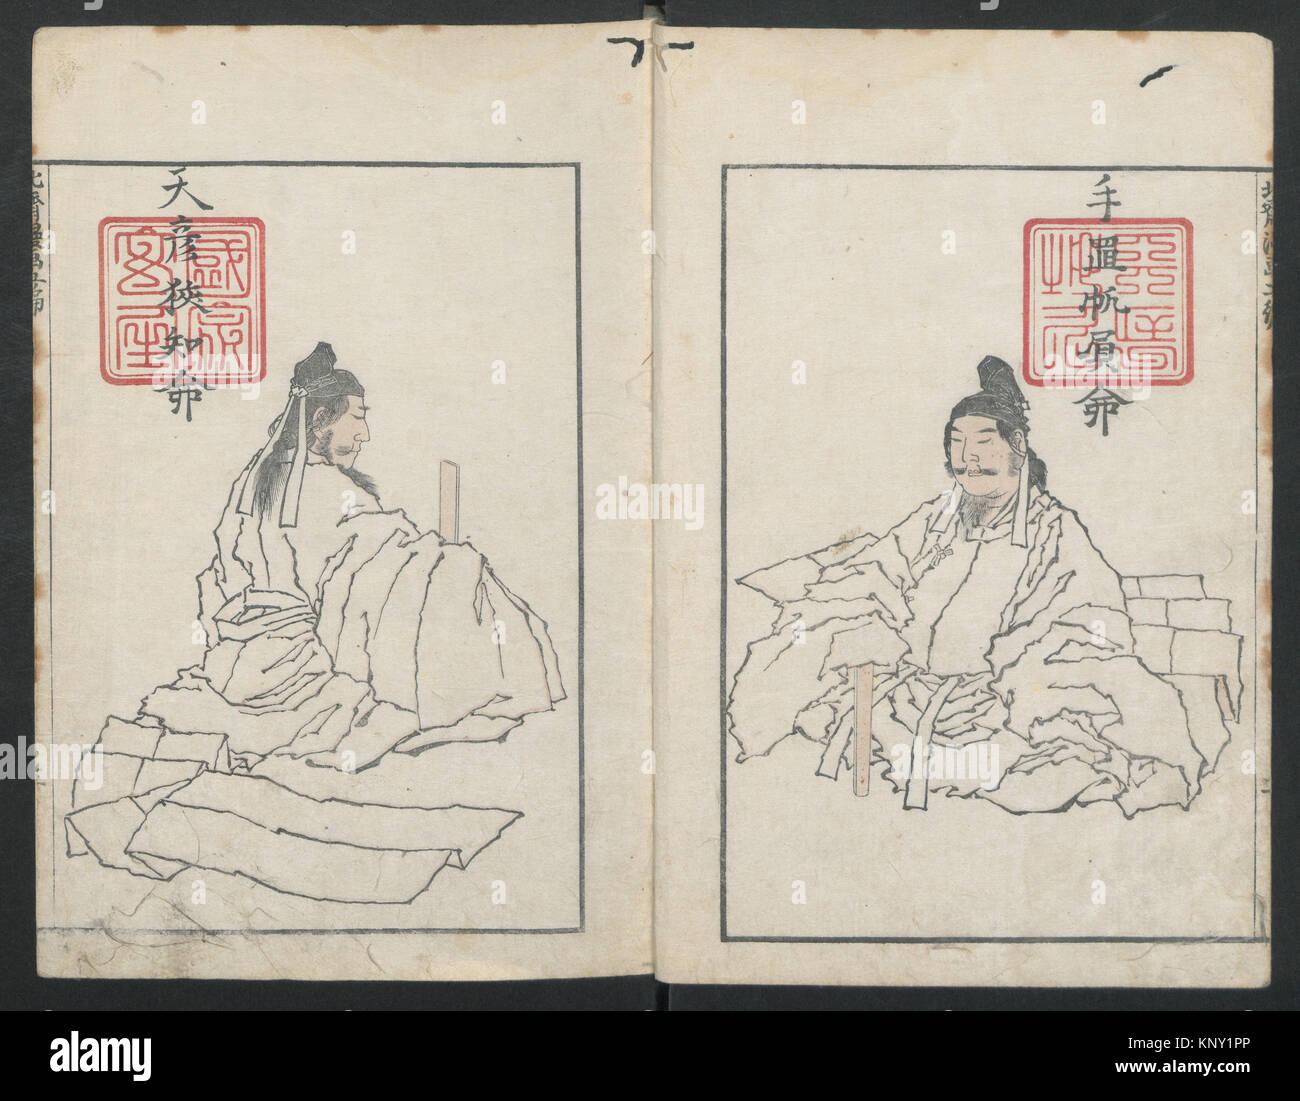 Transmitting the Spirit, Revealing the Form of Things: Hokusai Sketchbooks, volume 5 (Denshin kaishu: Hokusai manga, - Stock Image